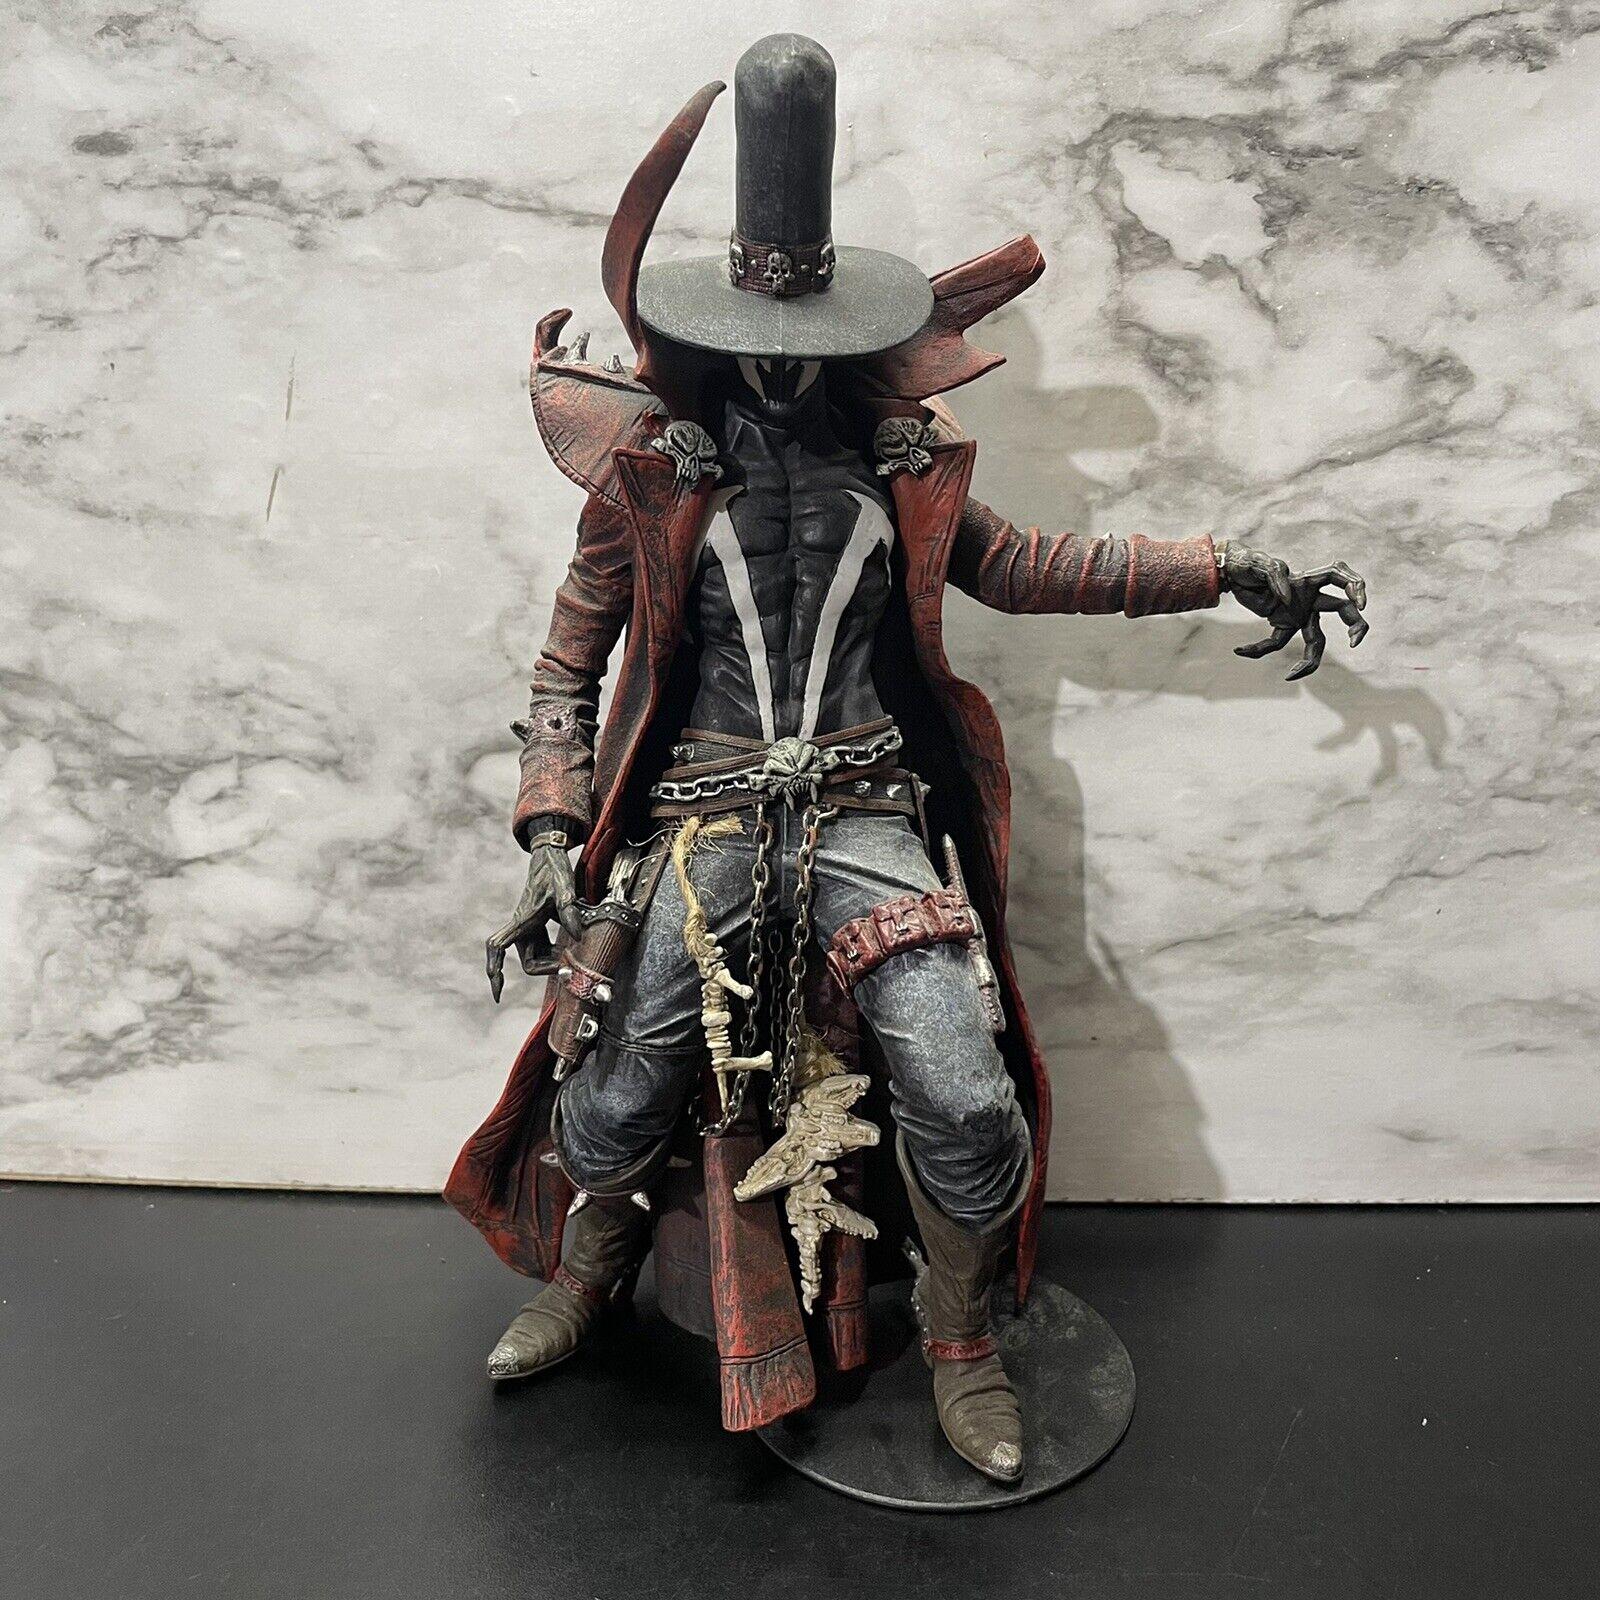 Gunslinger Spawn Series 27 9inch Figure Rare! on eBay thumbnail